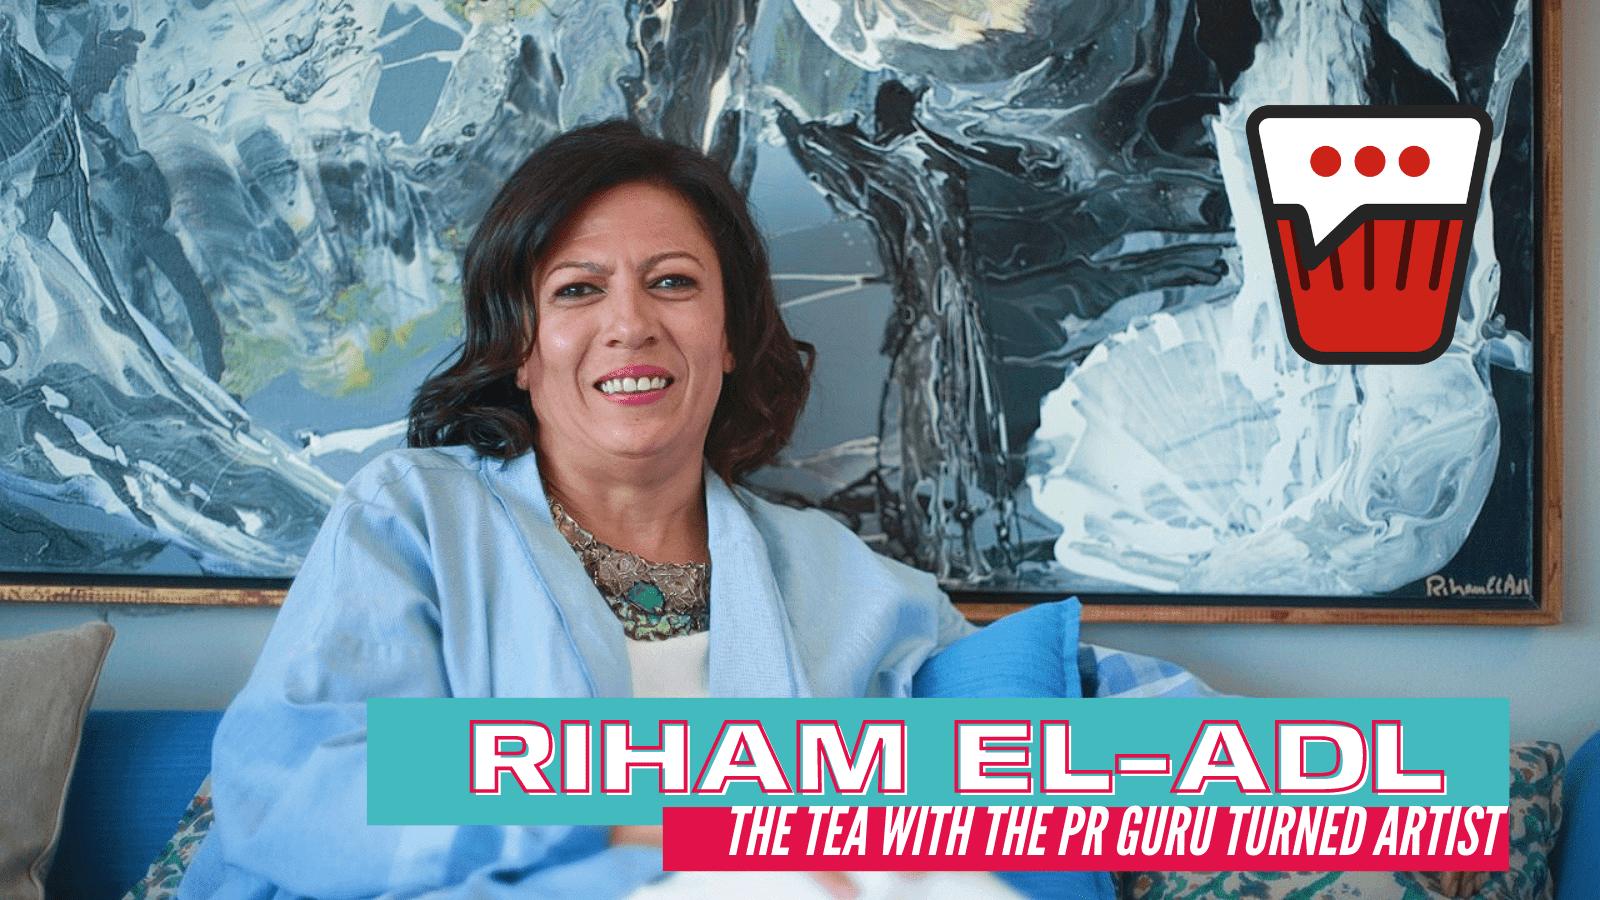 Riham El-Adl